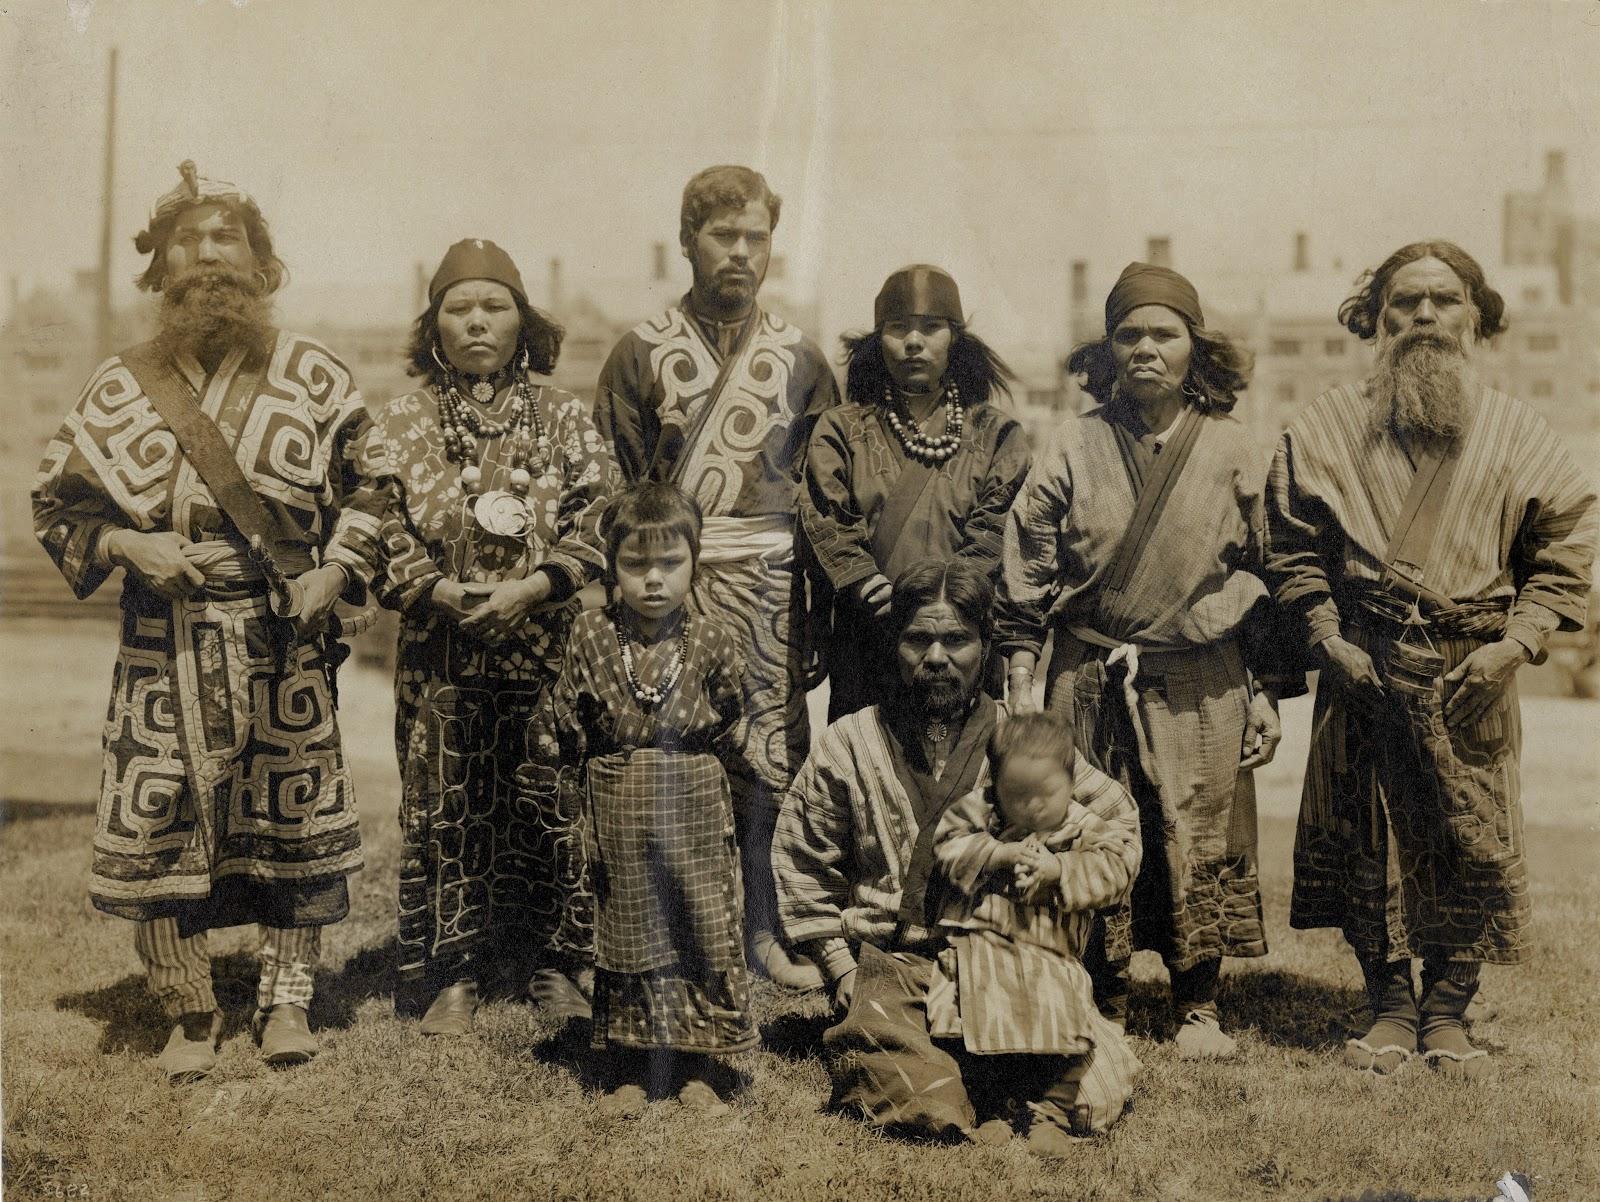 The Ainu People